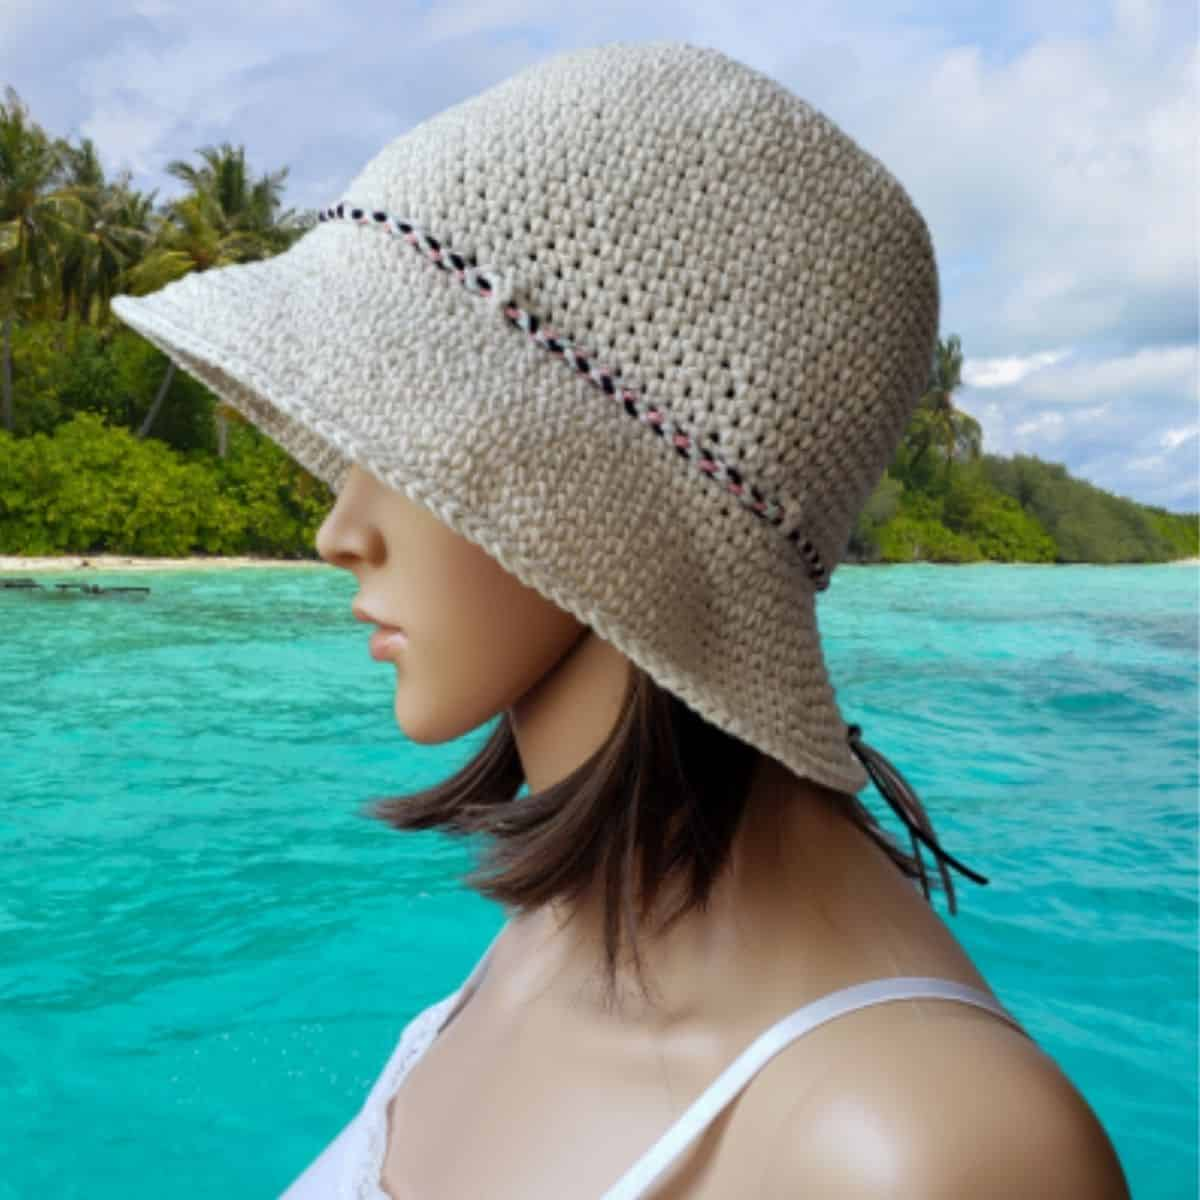 mannequin head wearing a sun hat